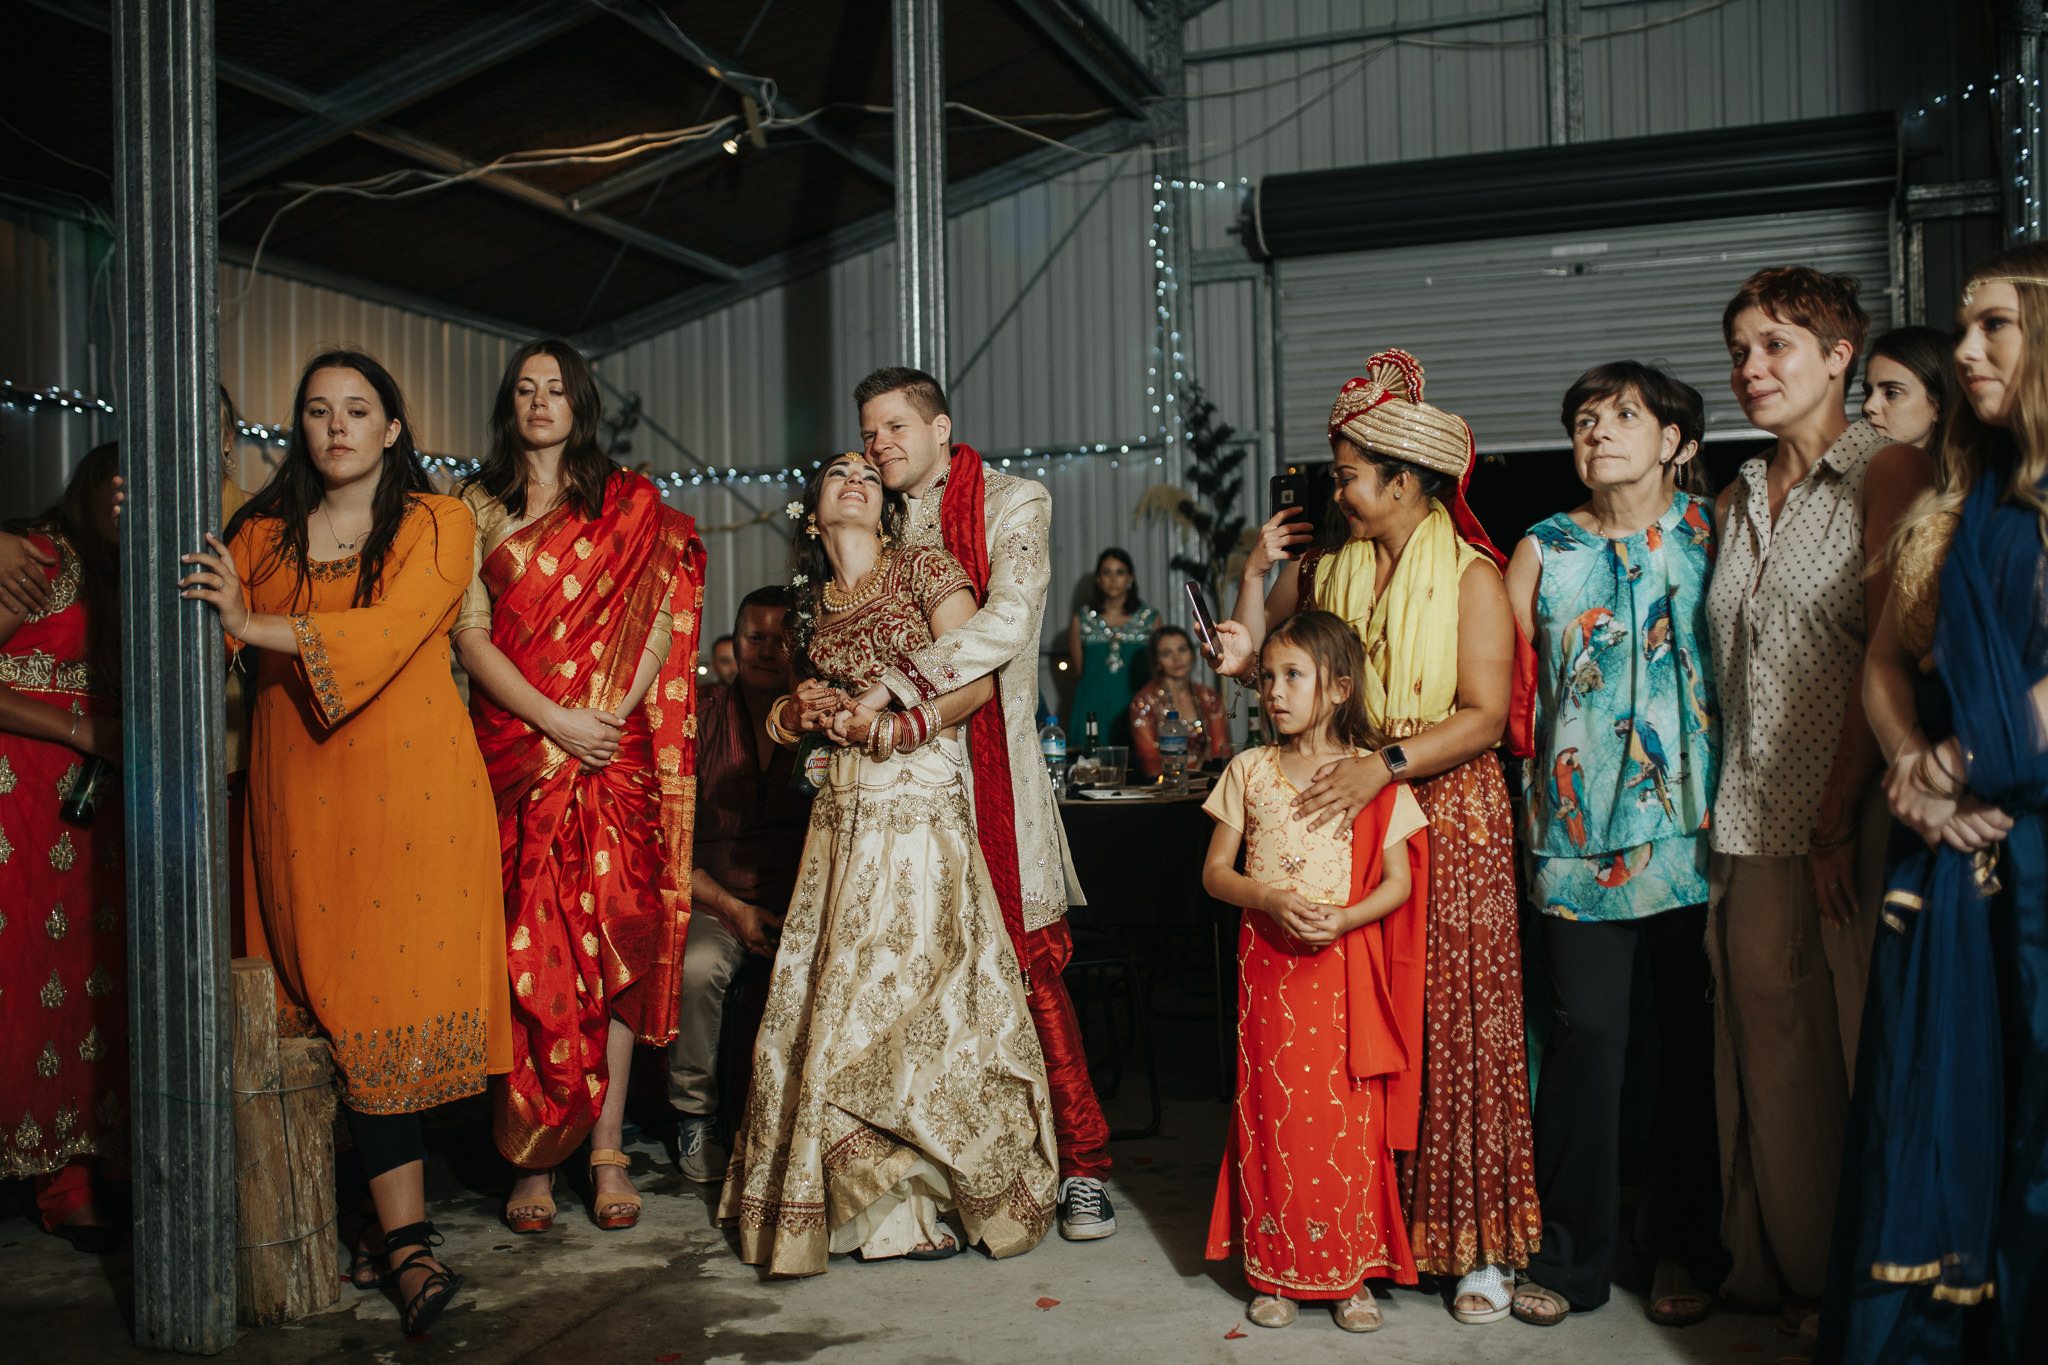 wainui-wedding-blog-aaronsami-254.jpg